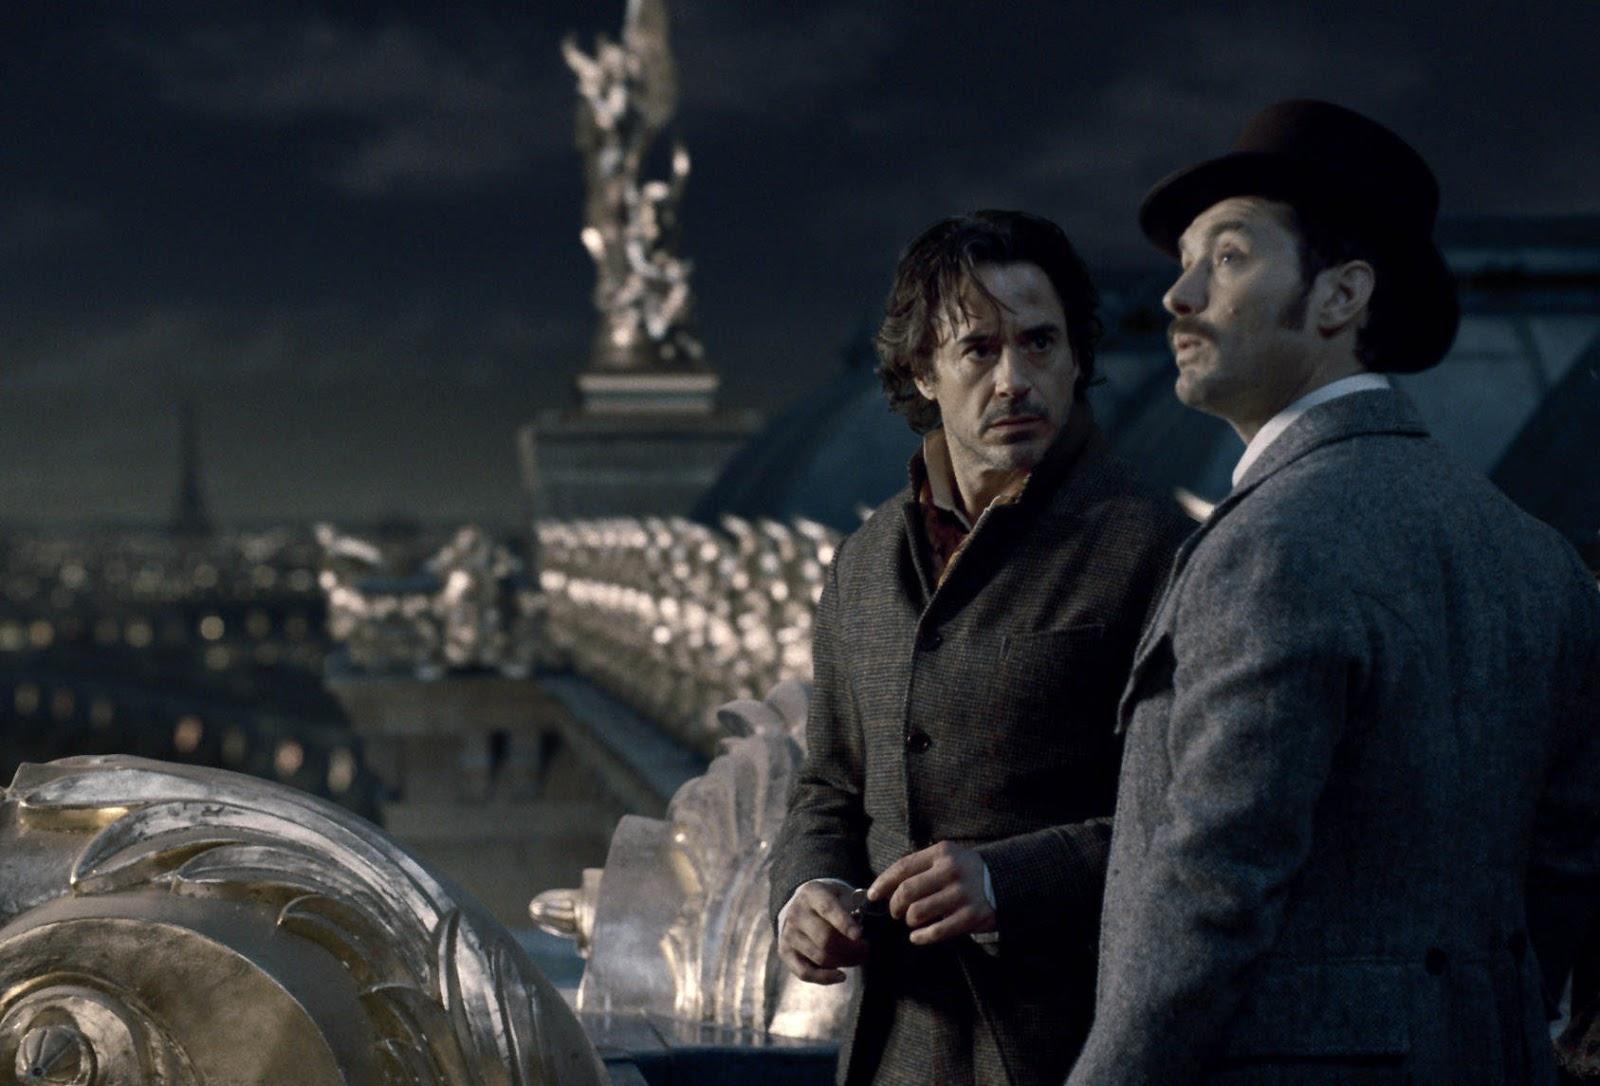 http://1.bp.blogspot.com/-MFoPPqokt_c/Tv02ttOXNHI/AAAAAAAADtw/R2tnP3yII1o/s1600/Sherlock_Holmes.jpg